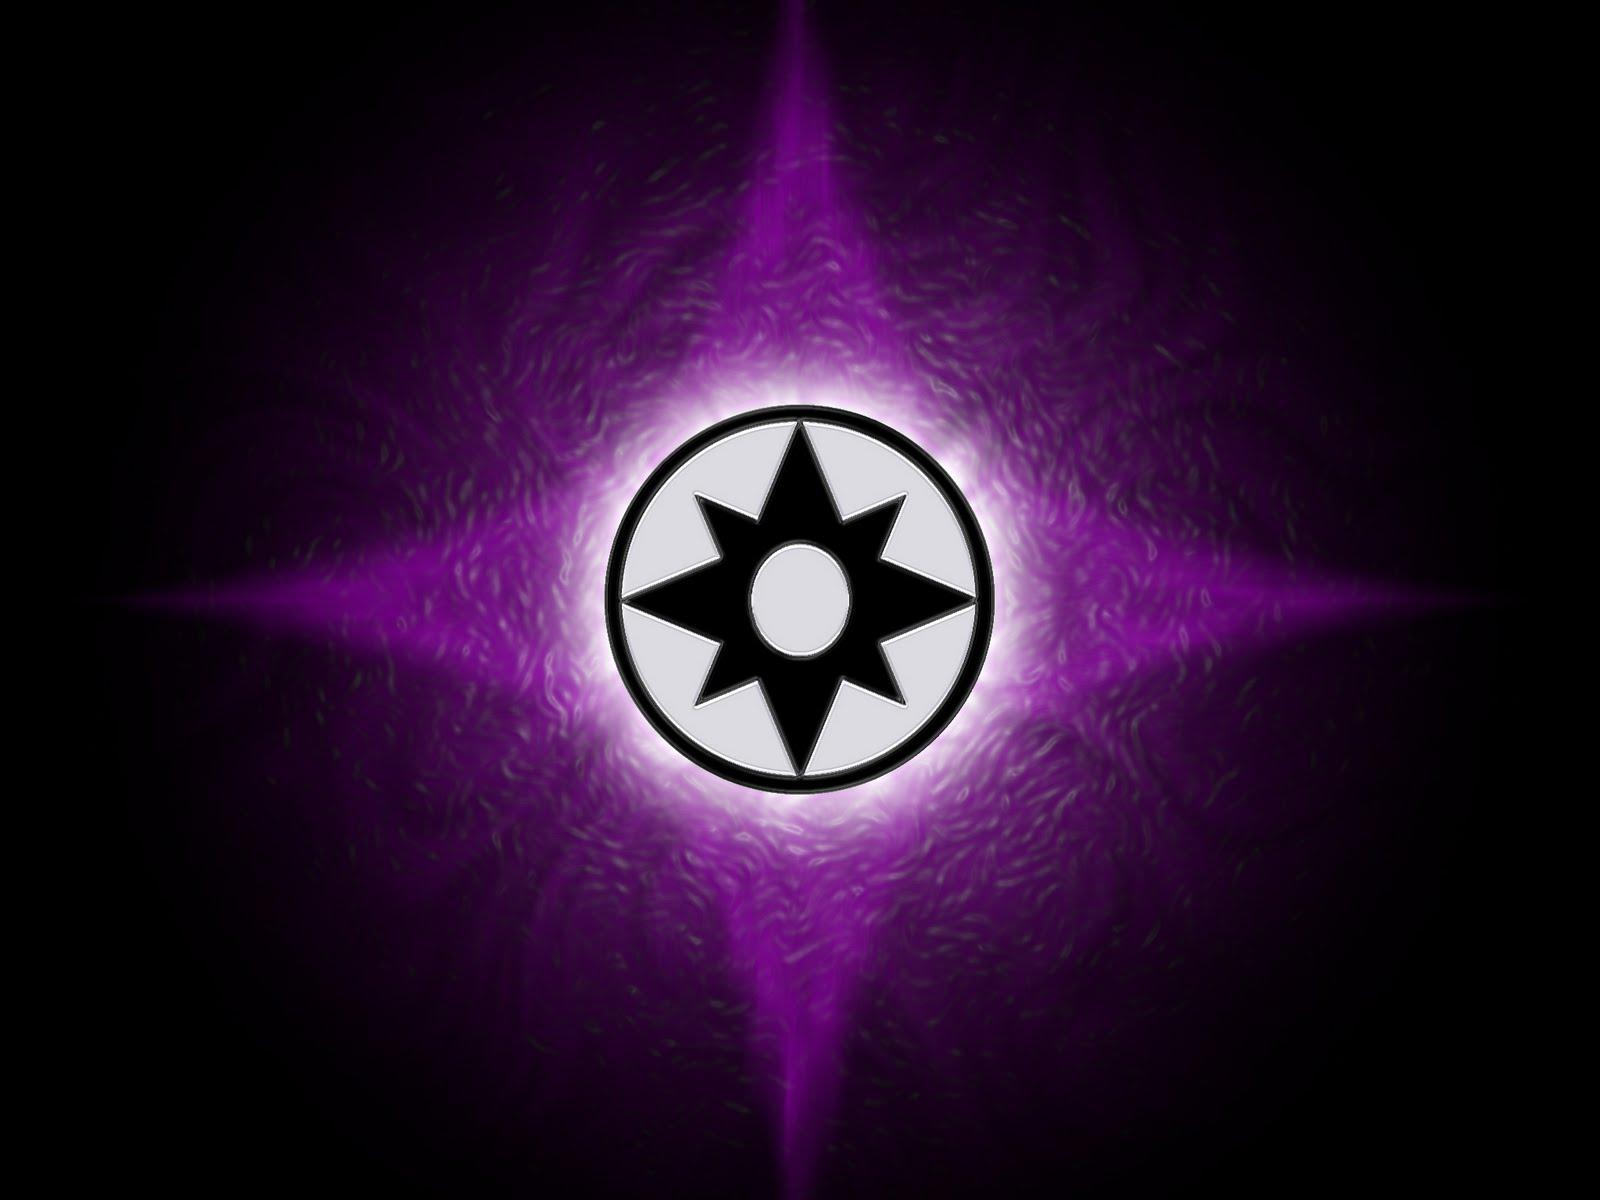 http://3.bp.blogspot.com/-8S-8OqSuGqw/TfiiOsz0H5I/AAAAAAAADL8/dC5HcyXYe44/s1600/lantern+corps+wallpaper2.jpg